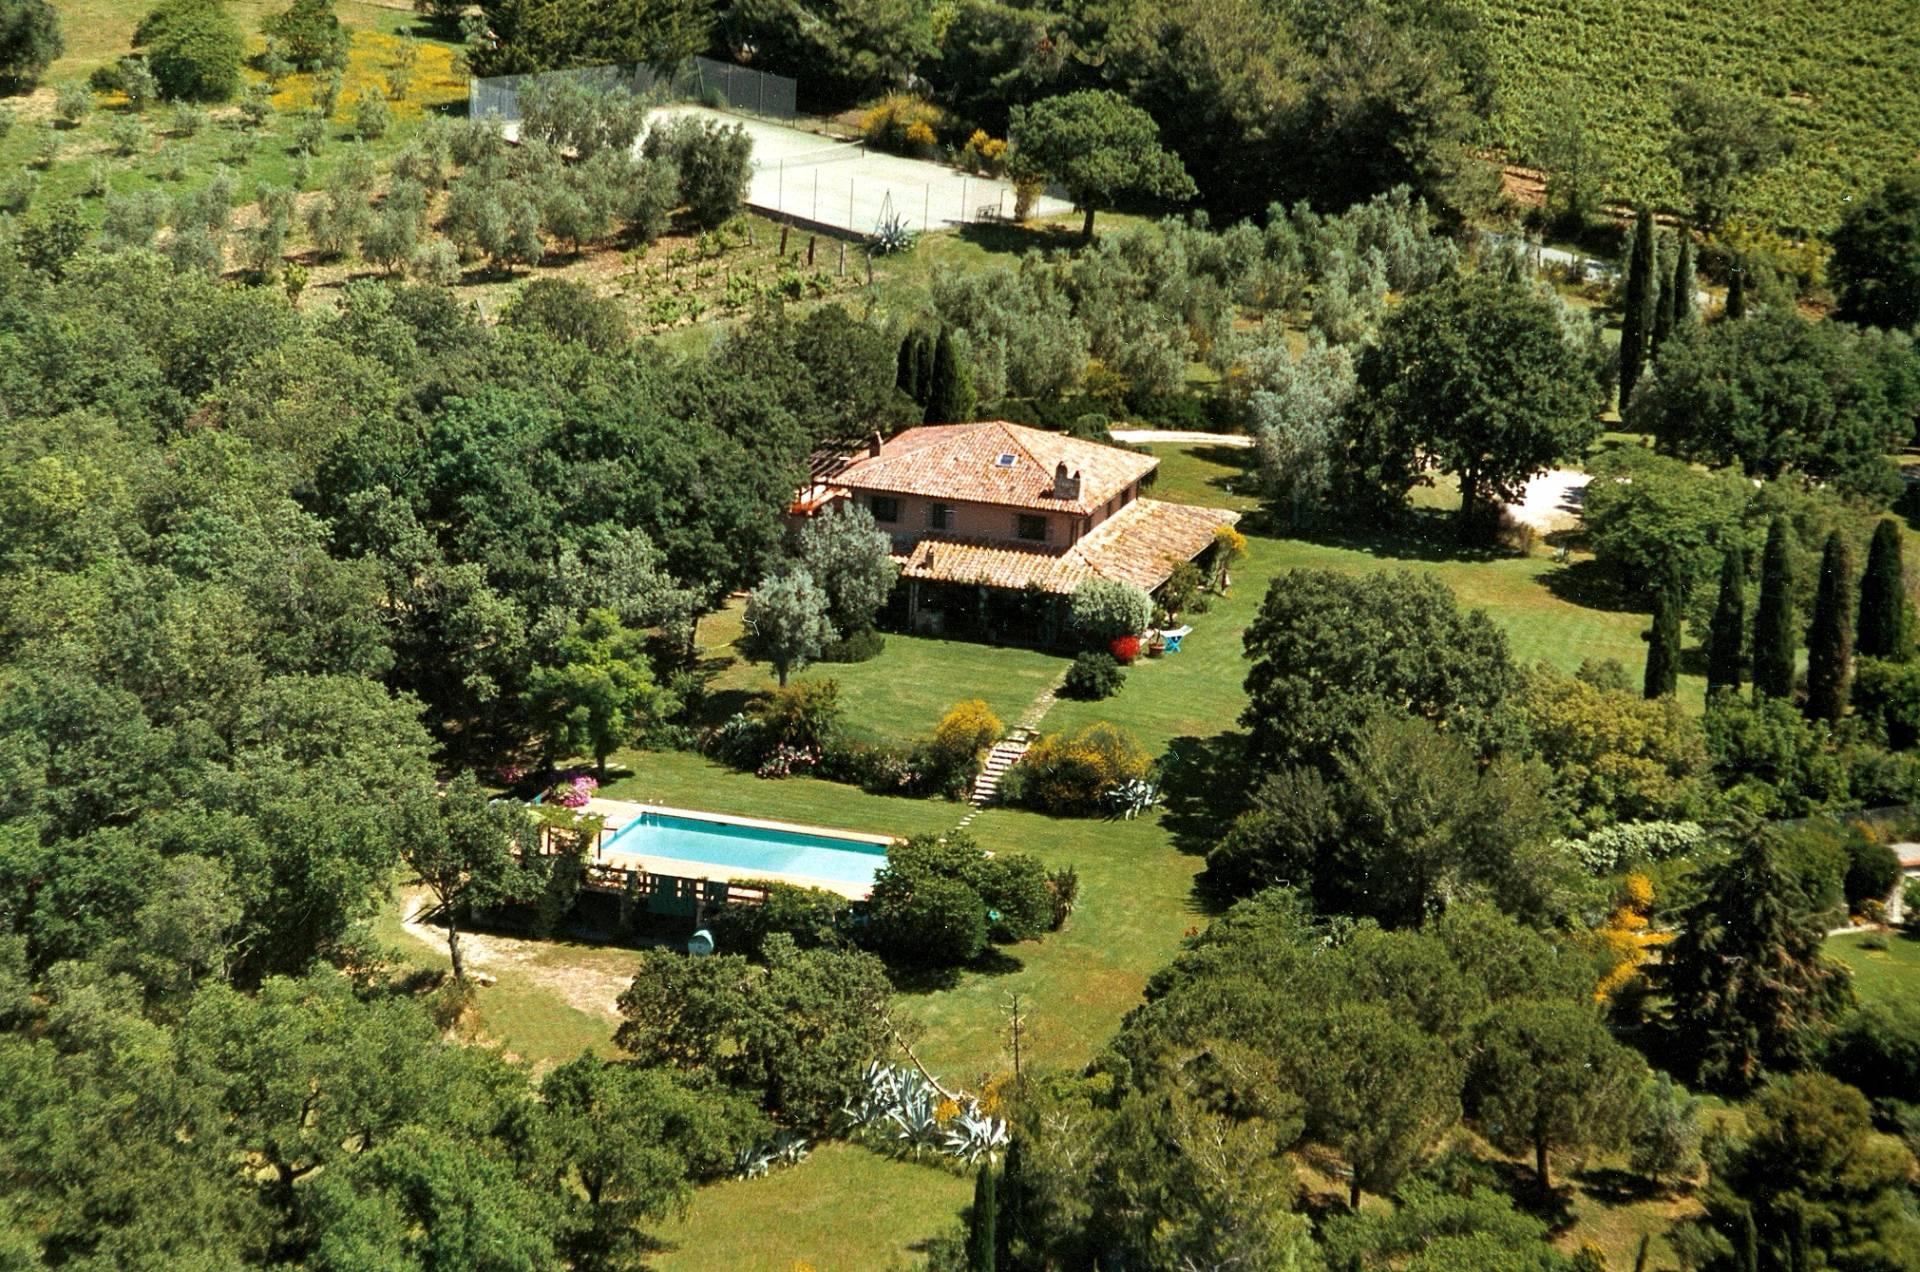 Splendida villa con viste mozzafiato del Monte Argentario - 1